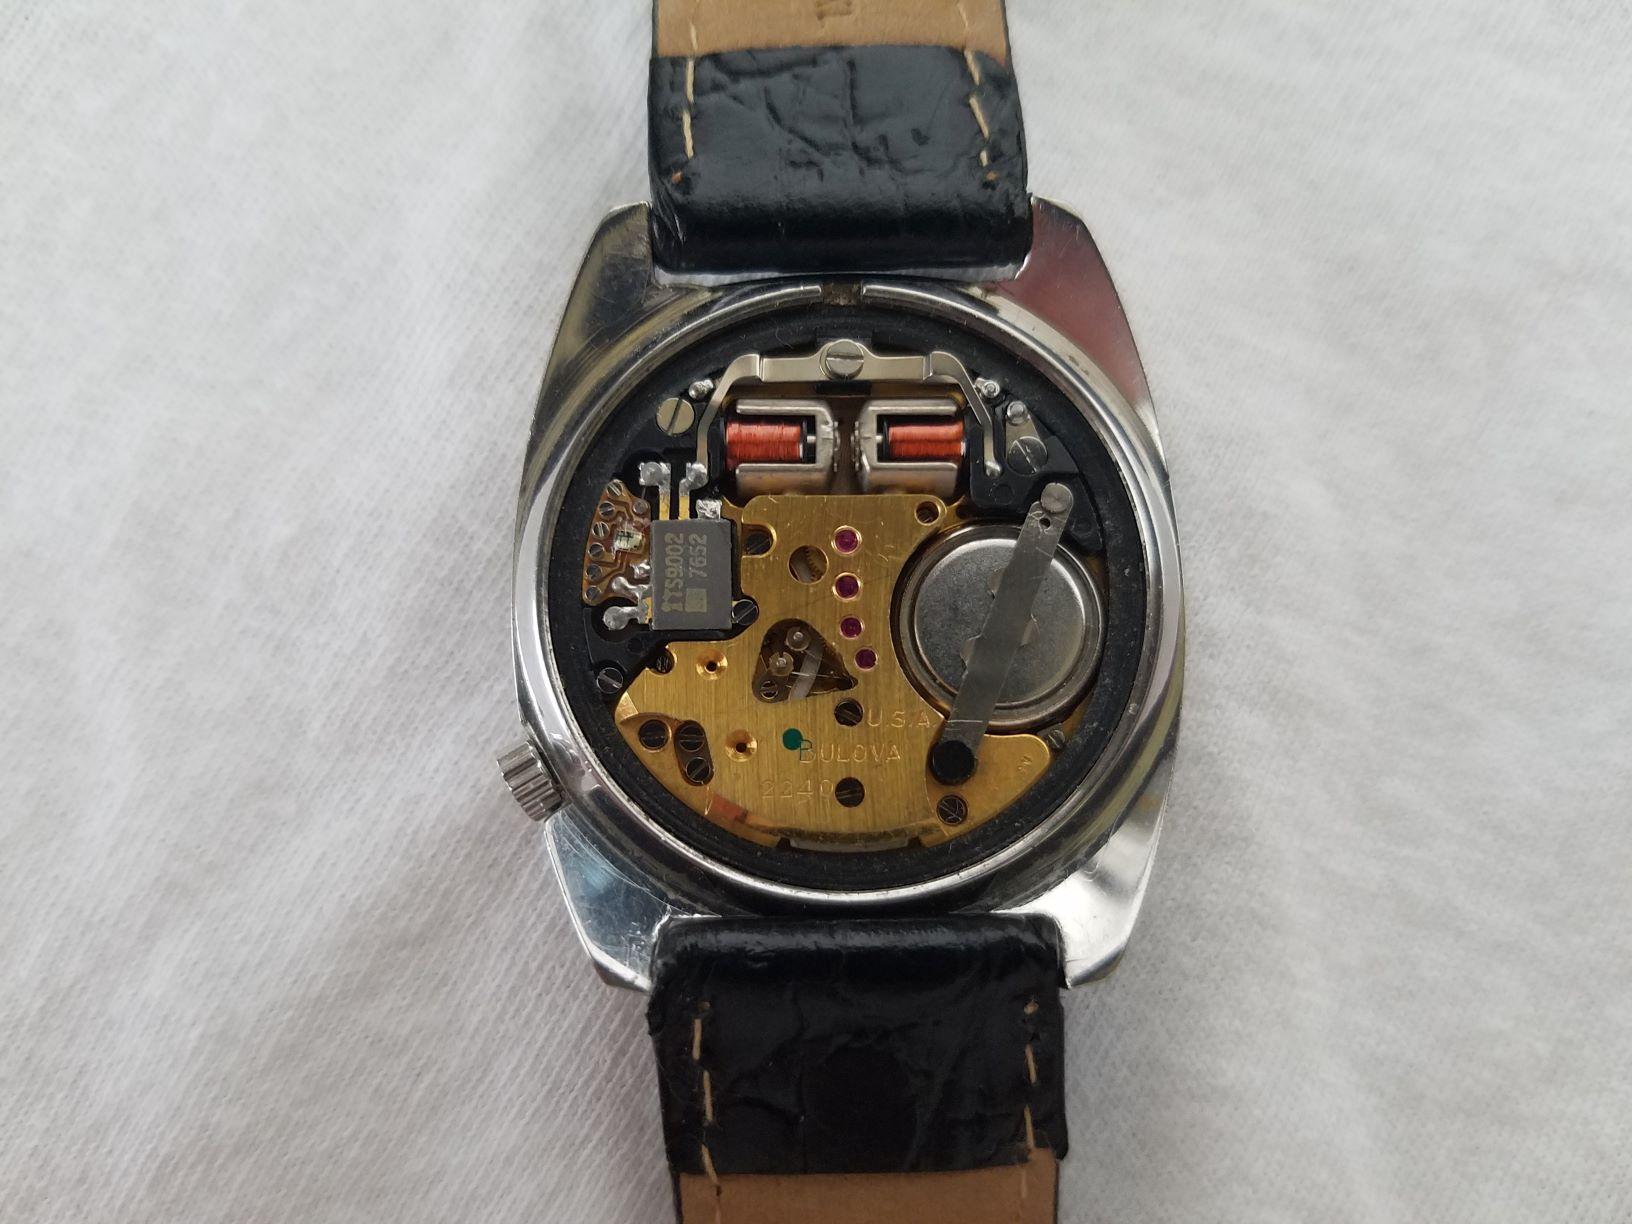 [field_year-1973] Bulova AccuQuartz 2240 Movement